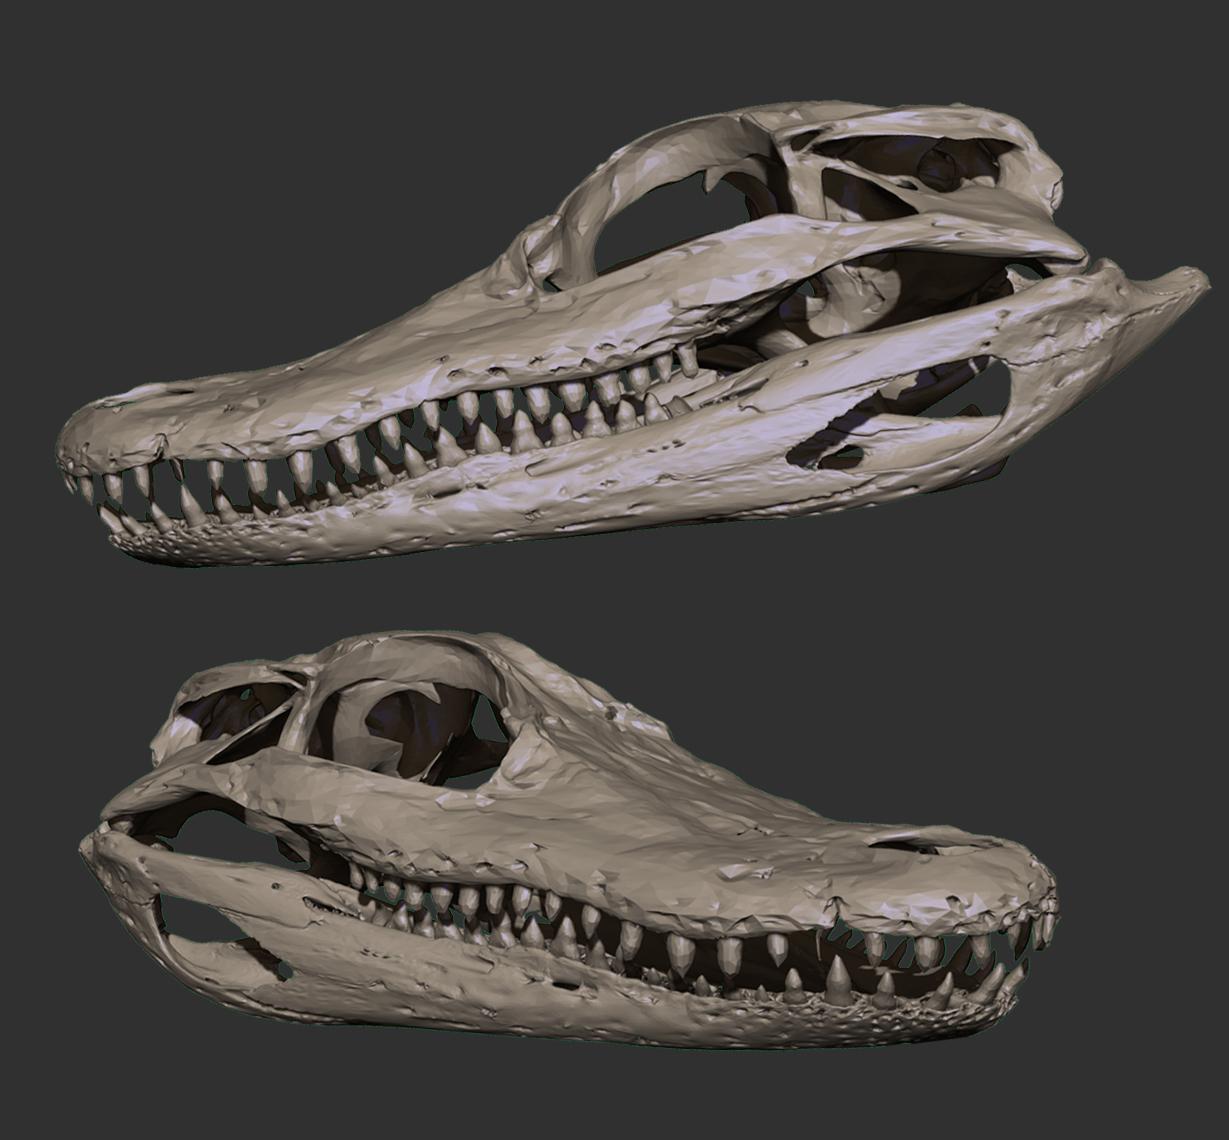 Alligator_.jpg